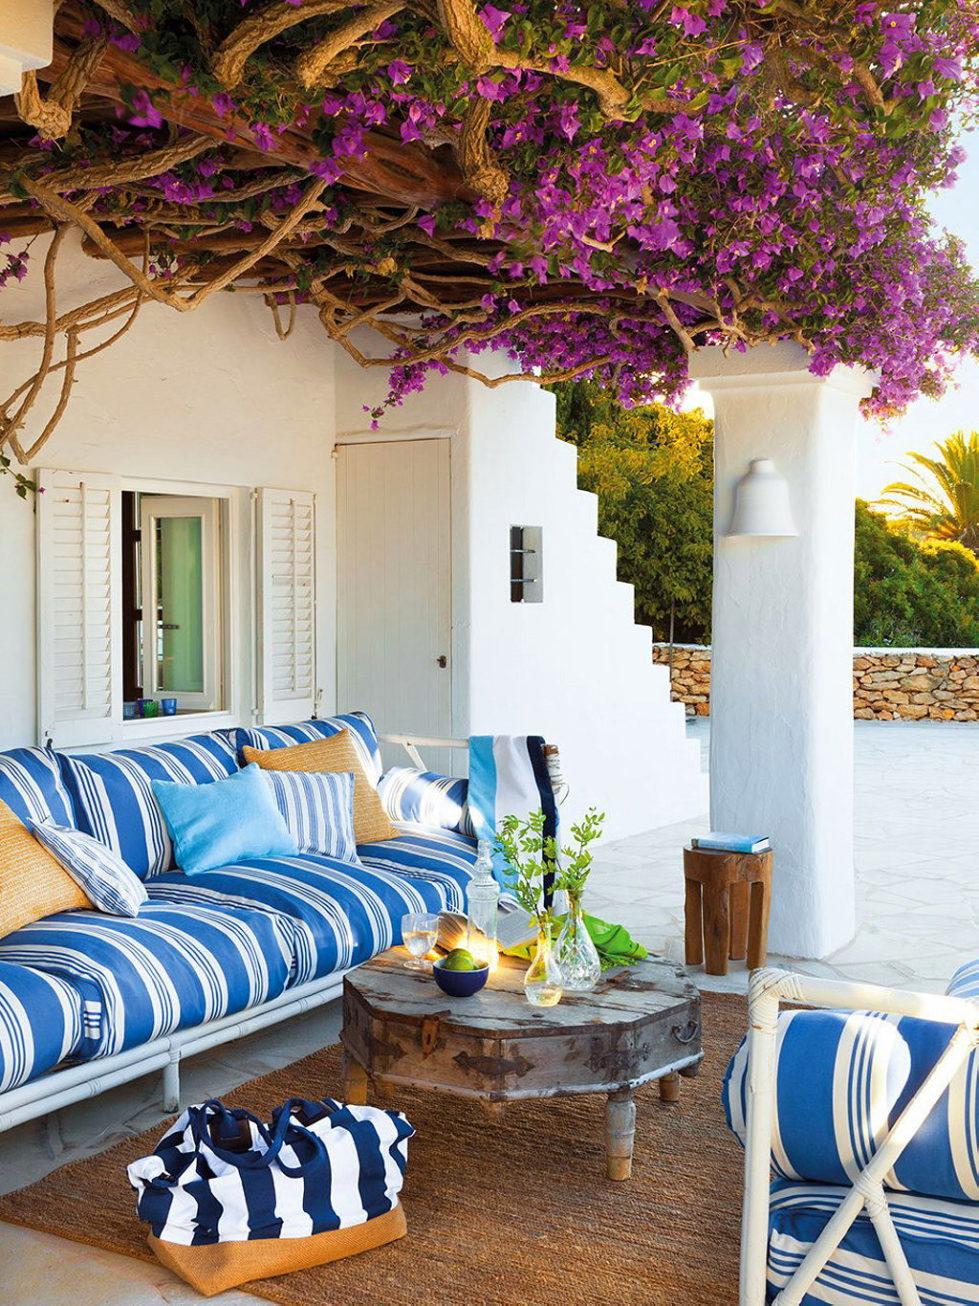 The House Of Mediterranean Style, Ibitza 1